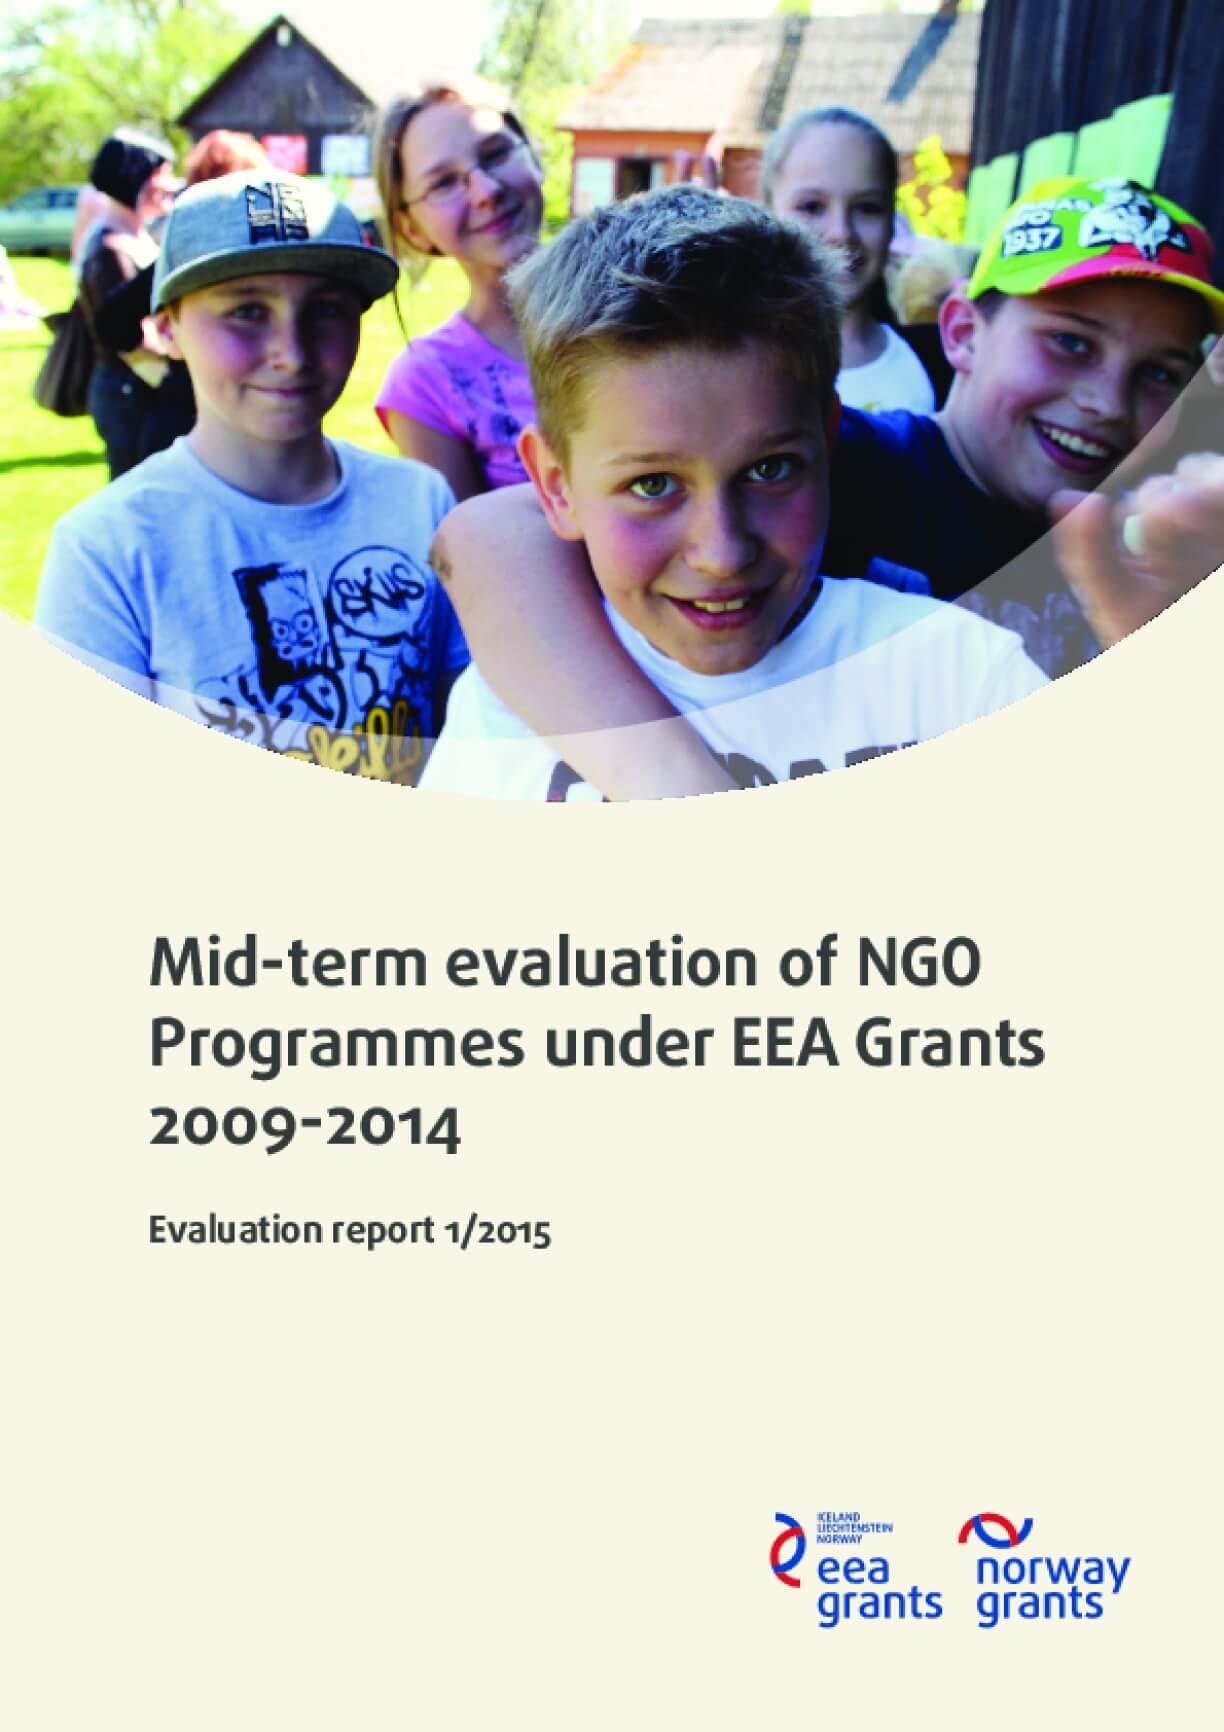 Mid-term Evaluation of NGO Programmes Under EEA Grants 2009-2014